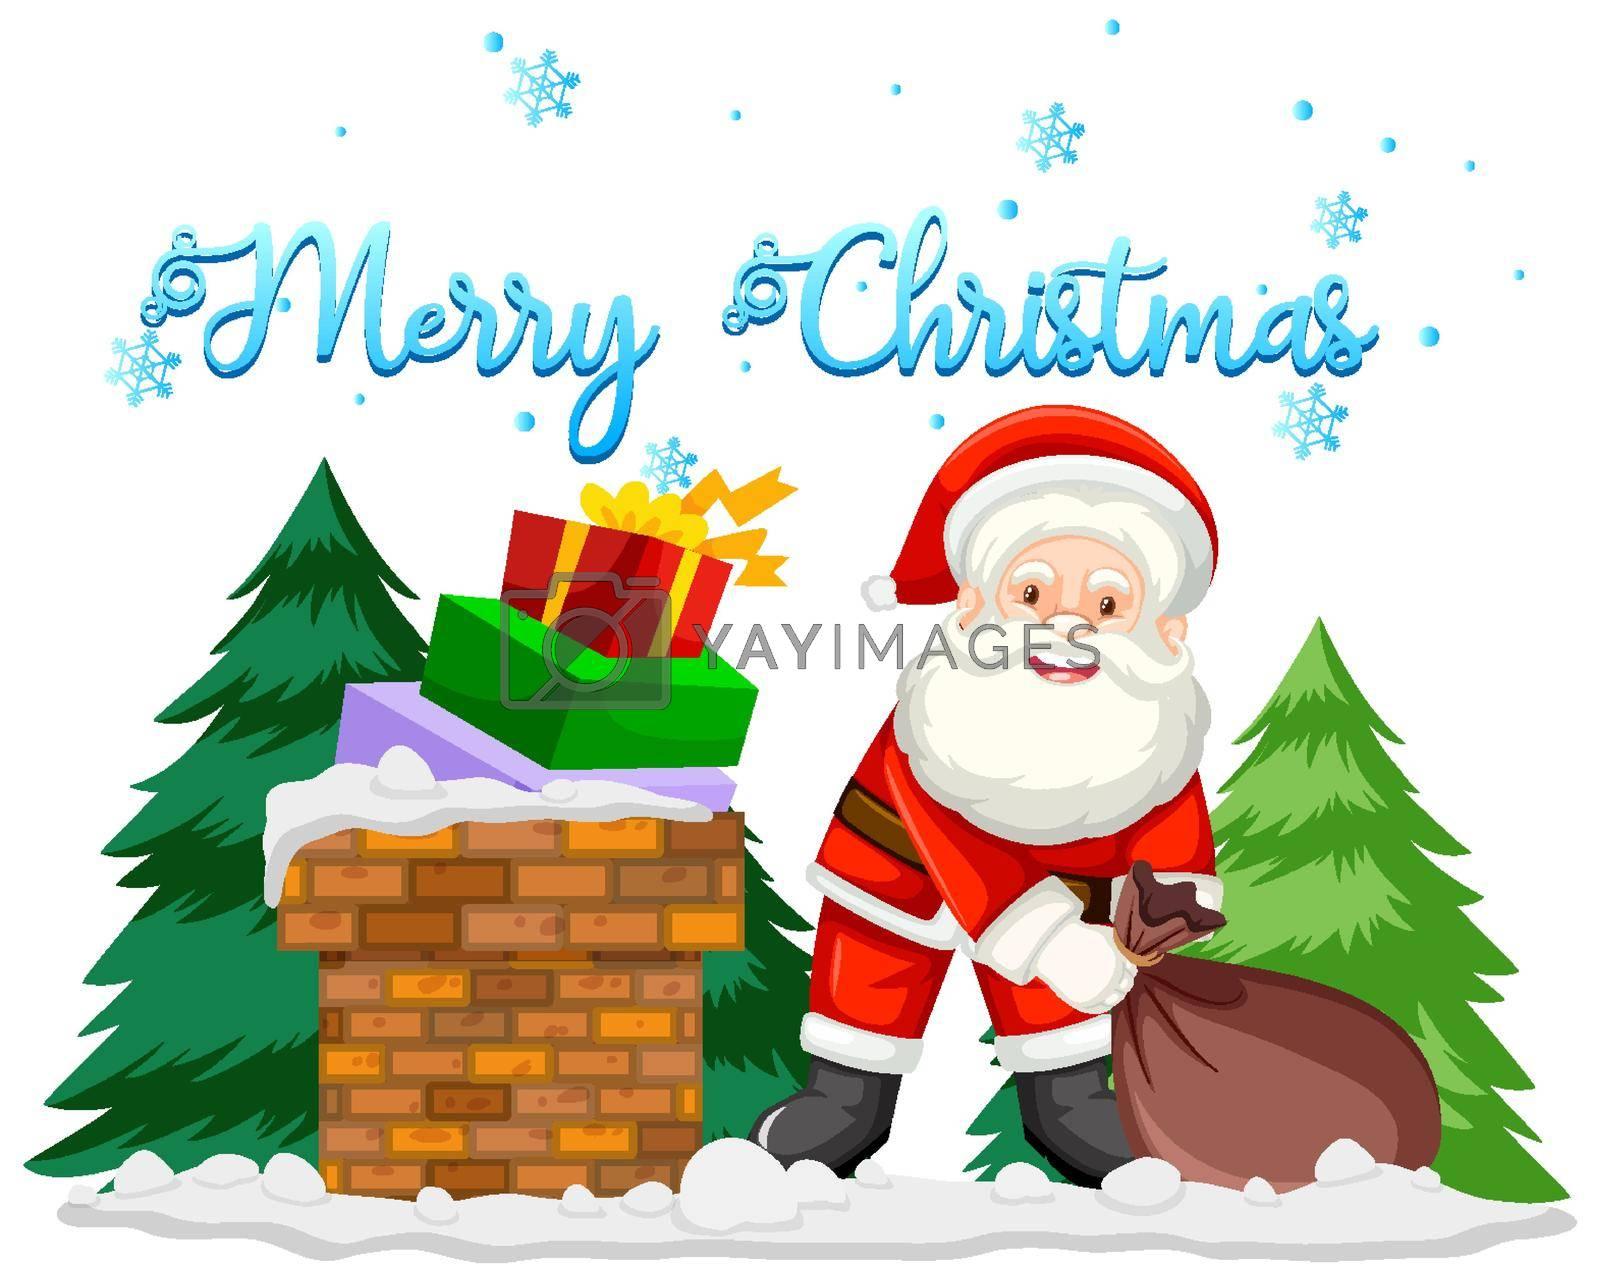 Christmas theme with Santa and presents illustration